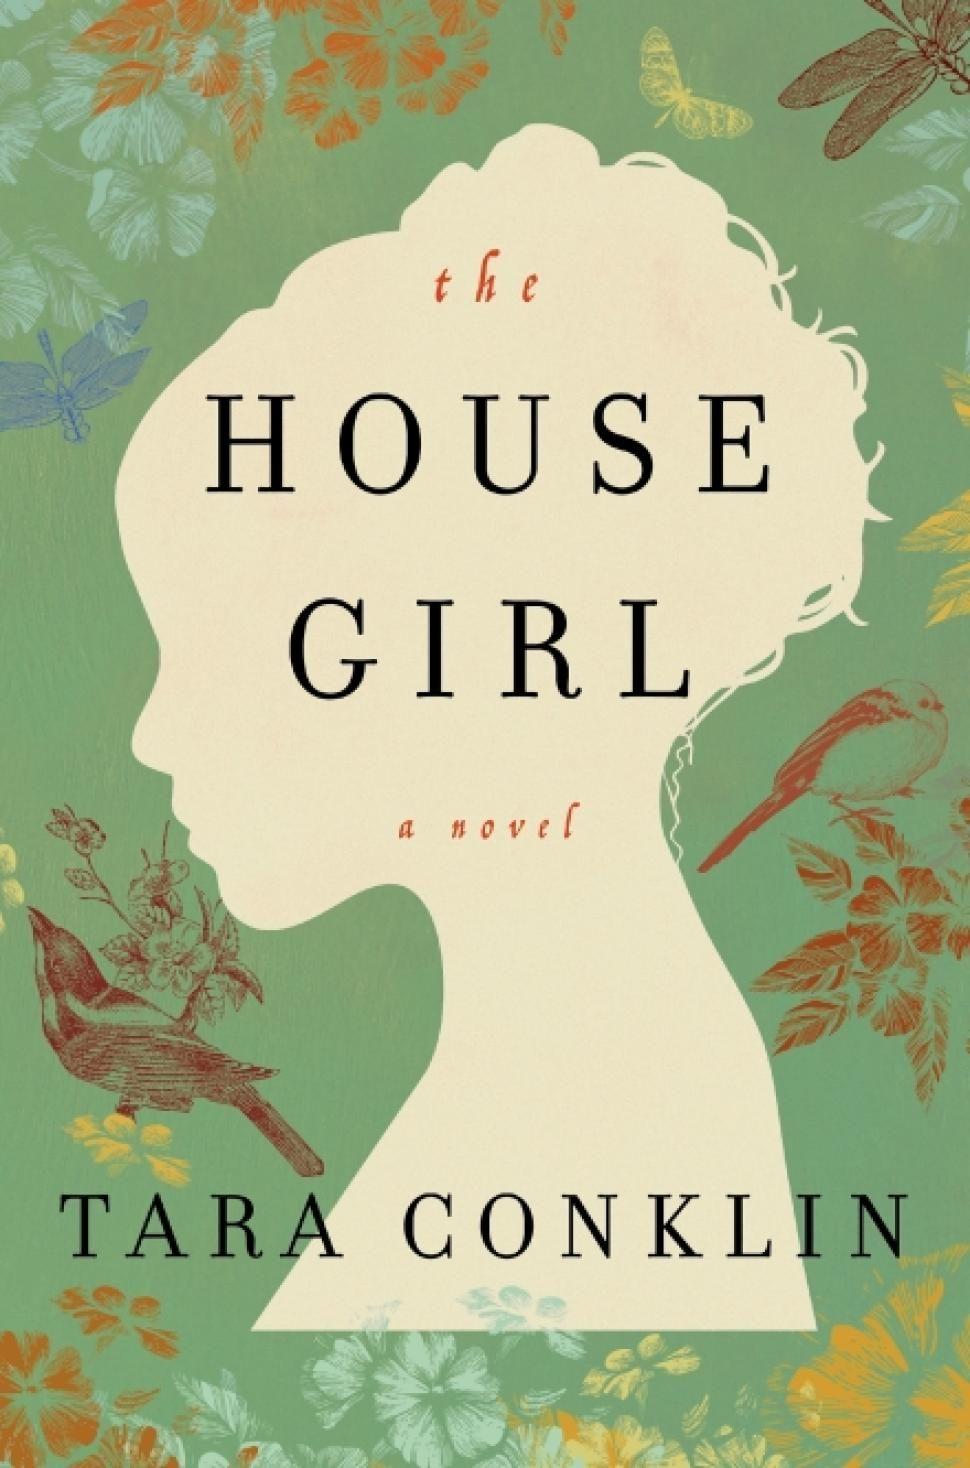 The House Girl: A Novel  Free Books